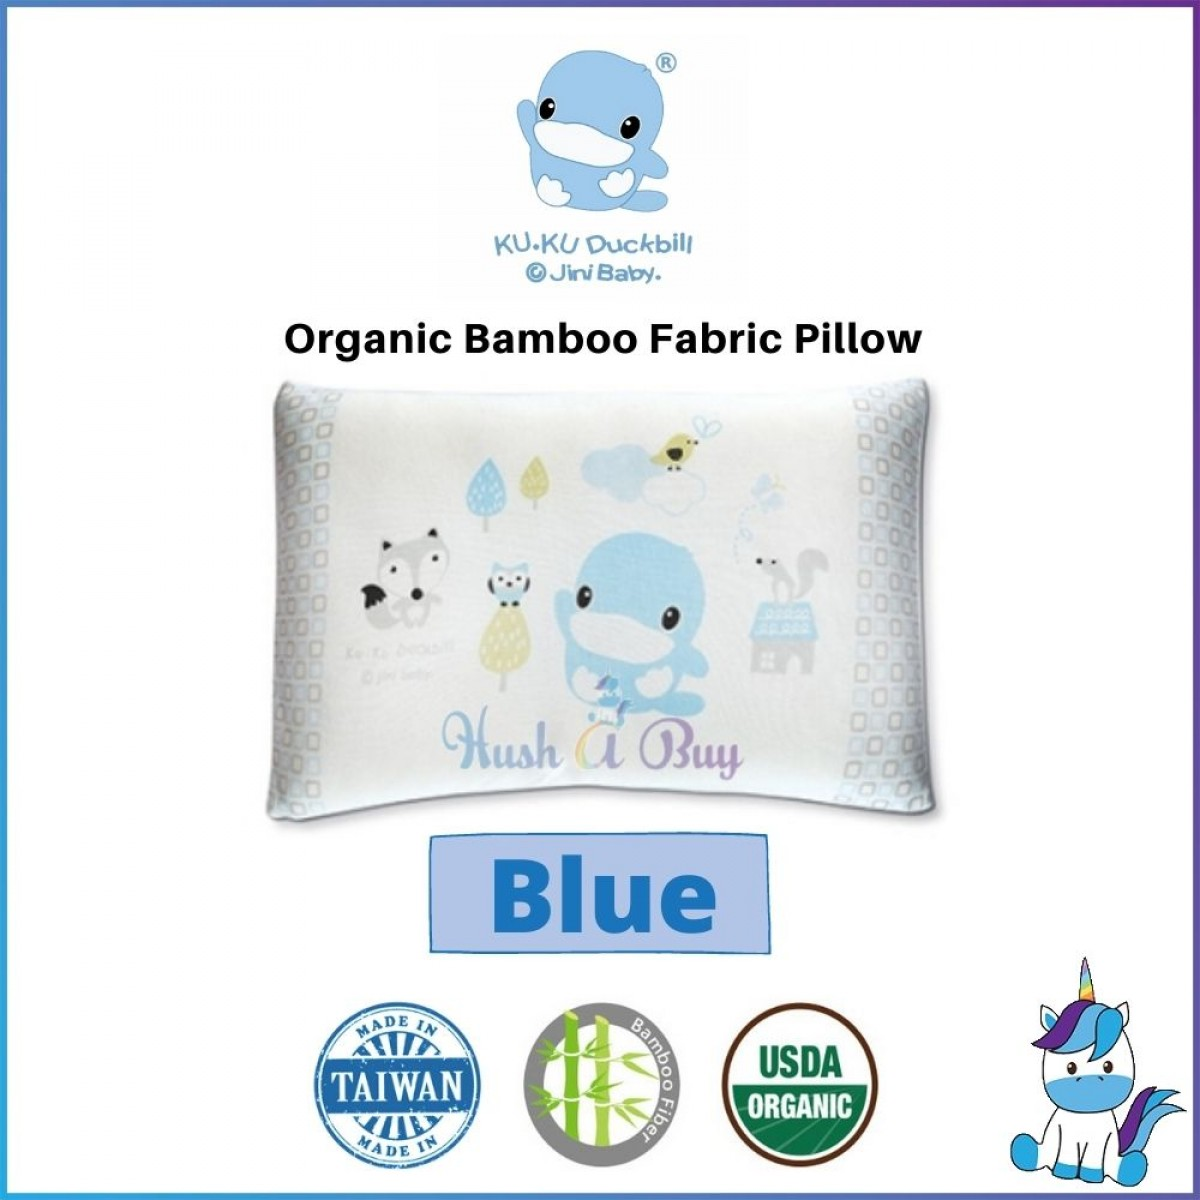 Kukuduckbill Organic Bamboo Fabric Pillow - Made in Taiwan